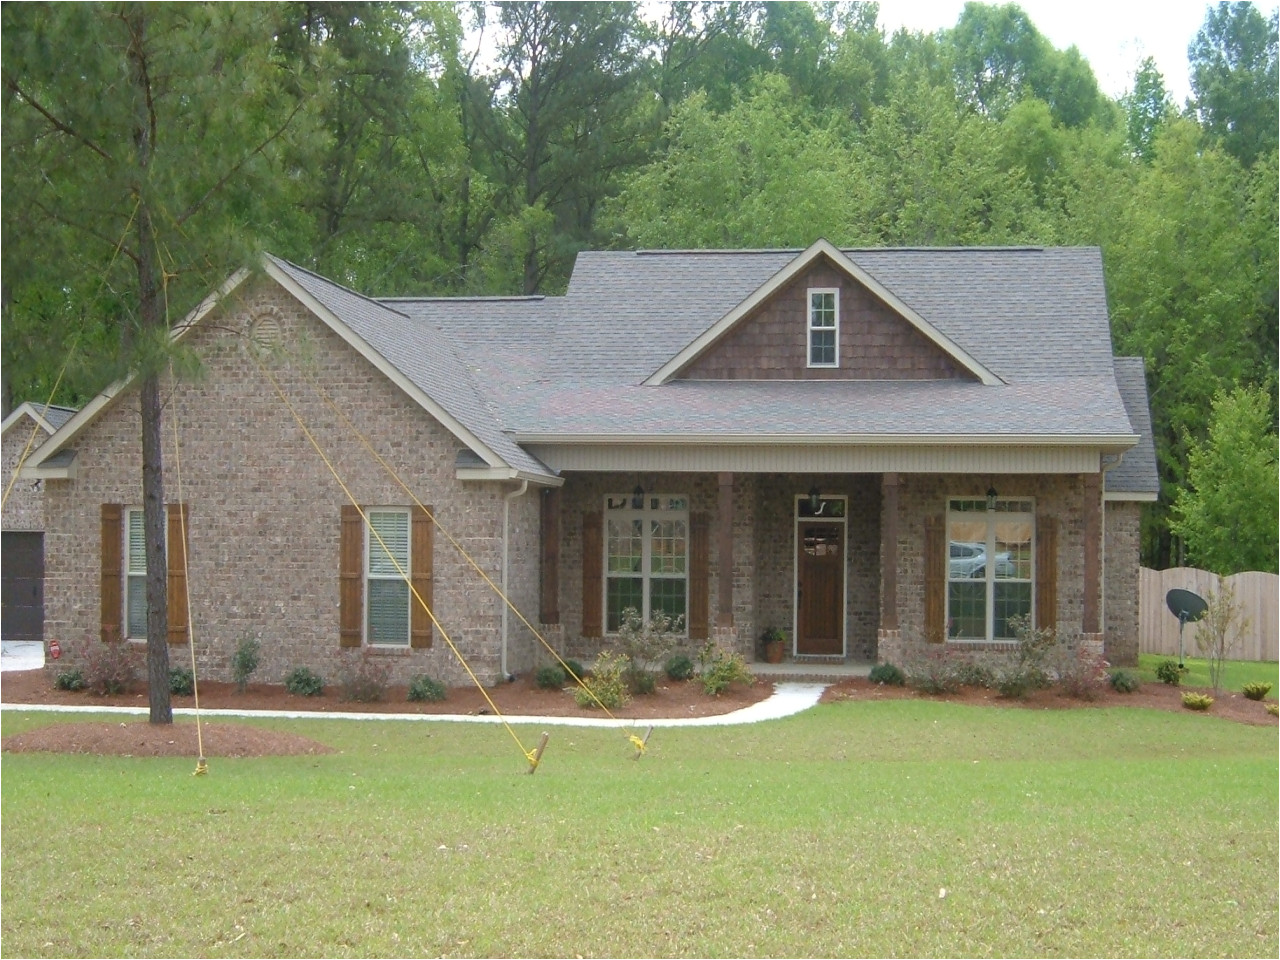 American Craftsman Home Plans American Craftsman Style House Craftsman Style Ranch House